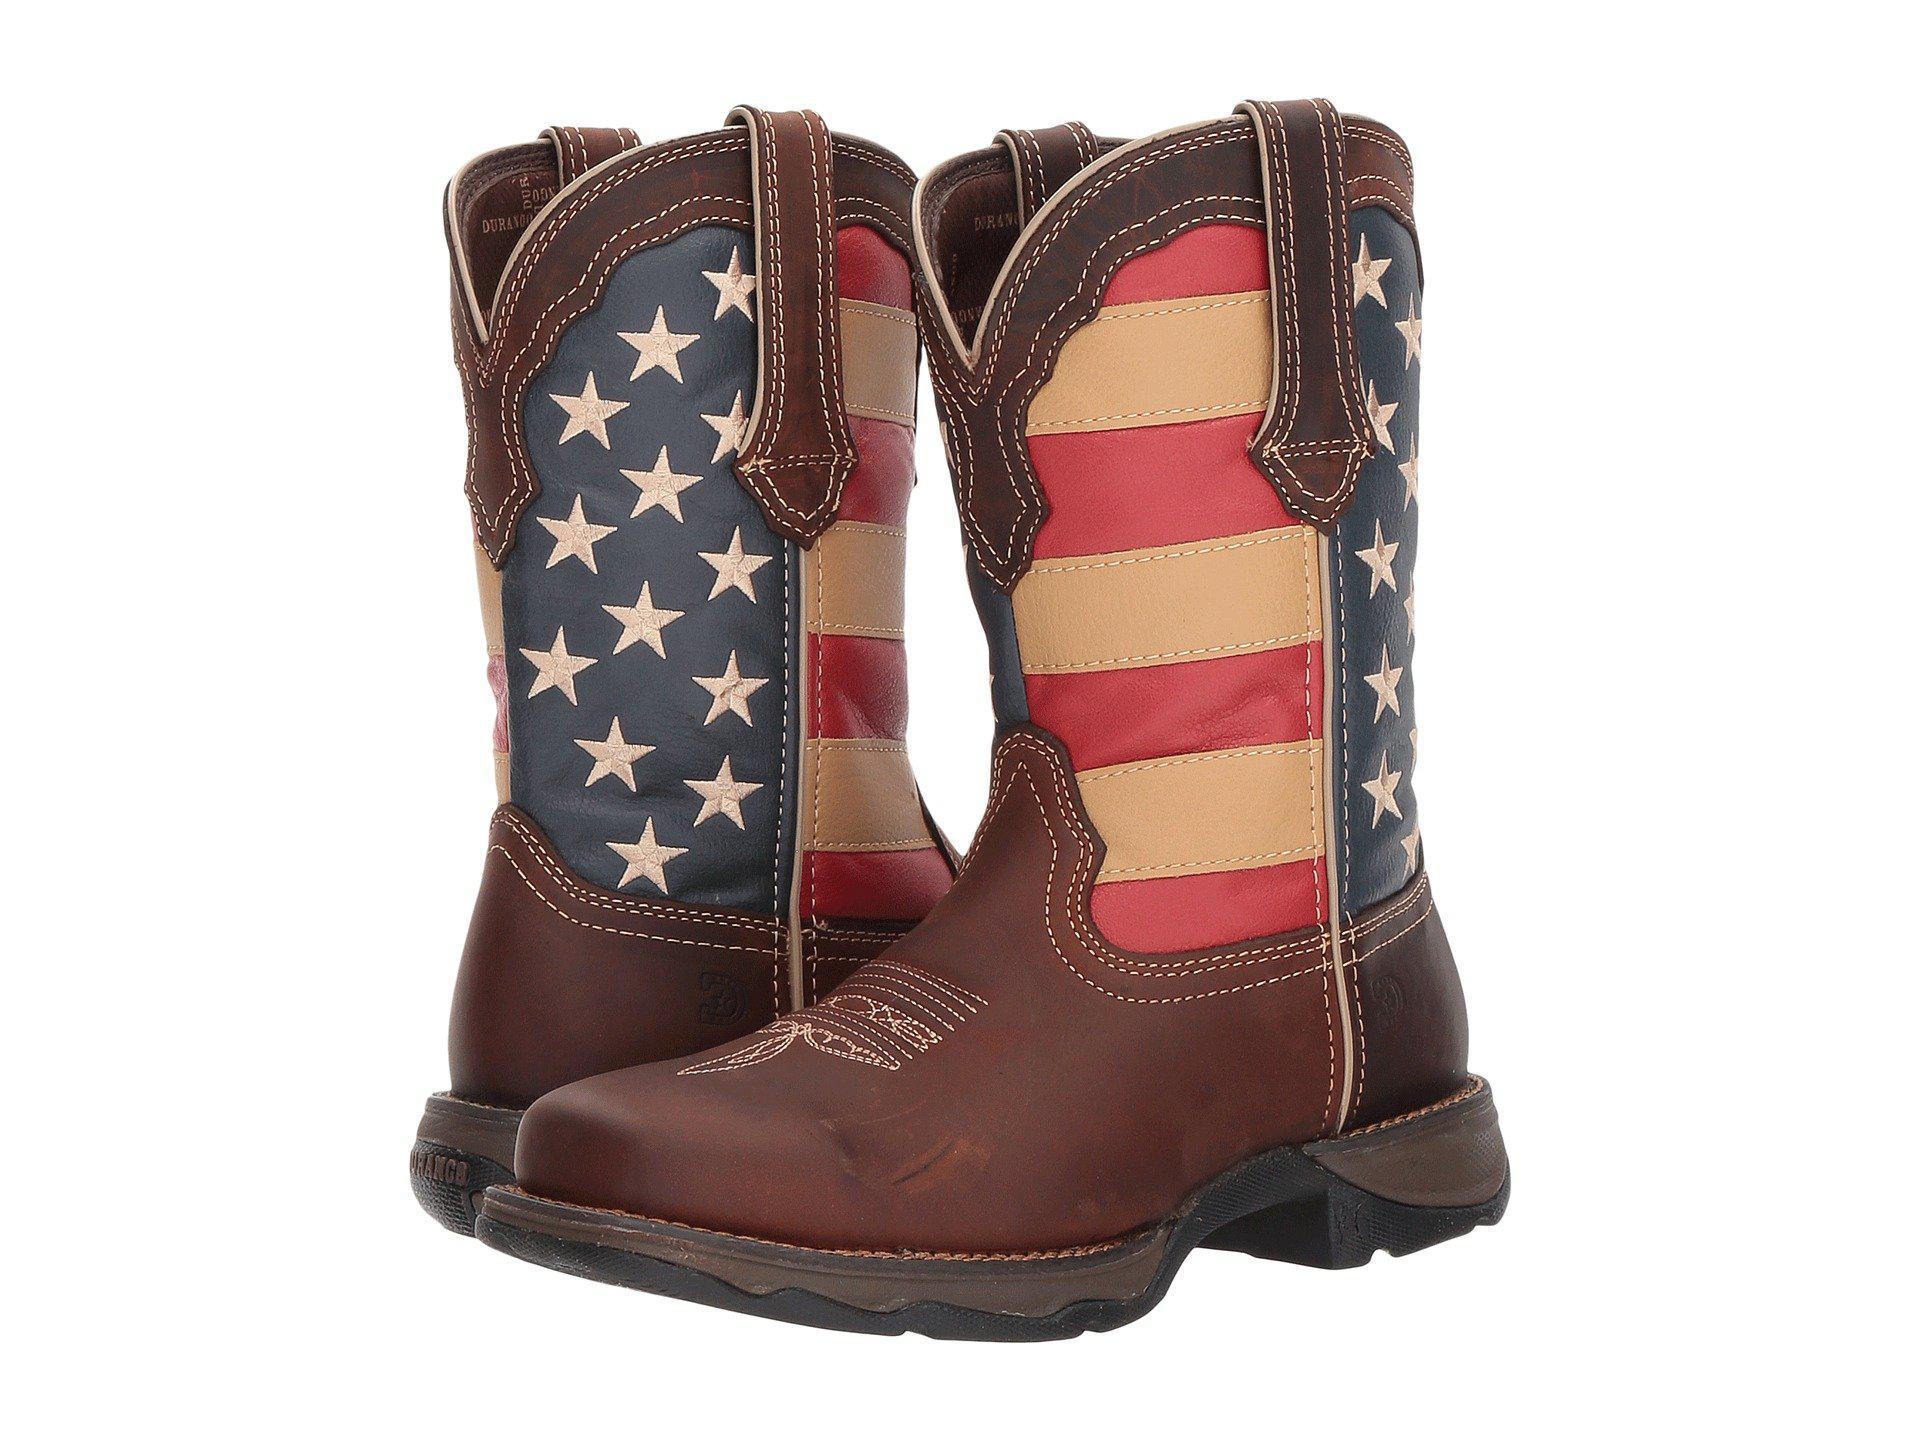 add127f73d4 Lyst - Durango Lady Rebel Flag Steel Toe (brown) Cowboy Boots in ...